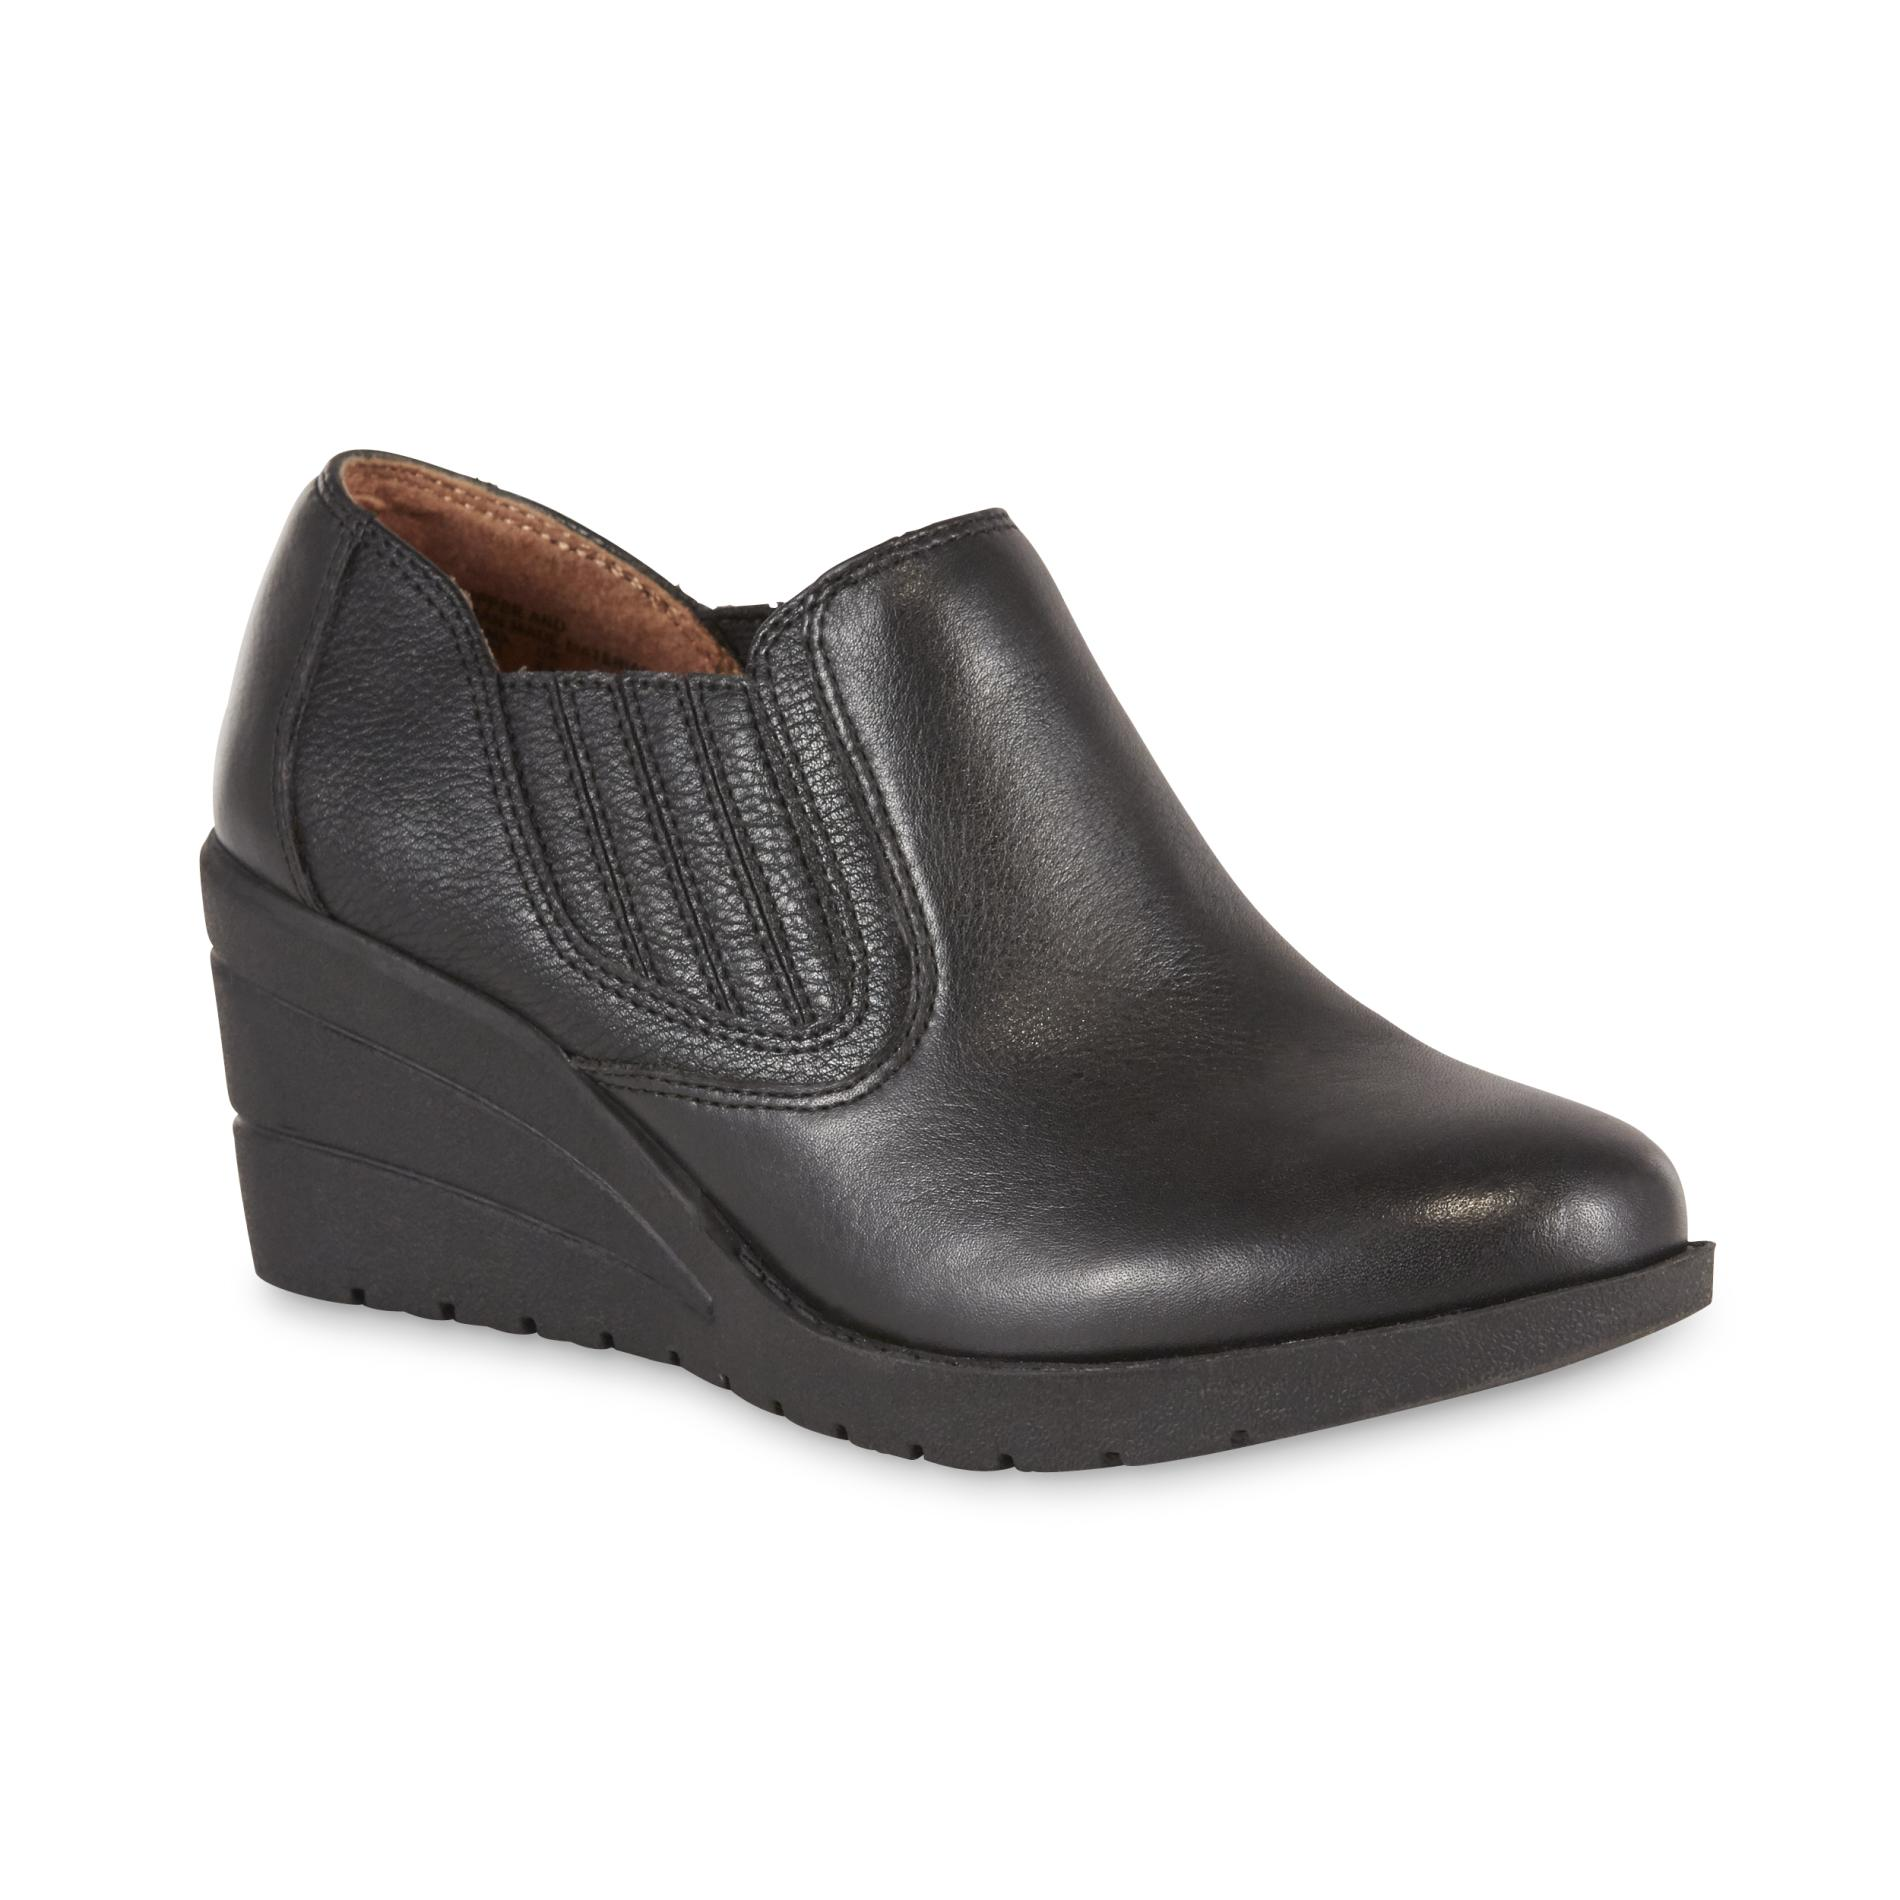 Thom Mcan Women' Deidre 2 Leather Wedge Loafer - Black